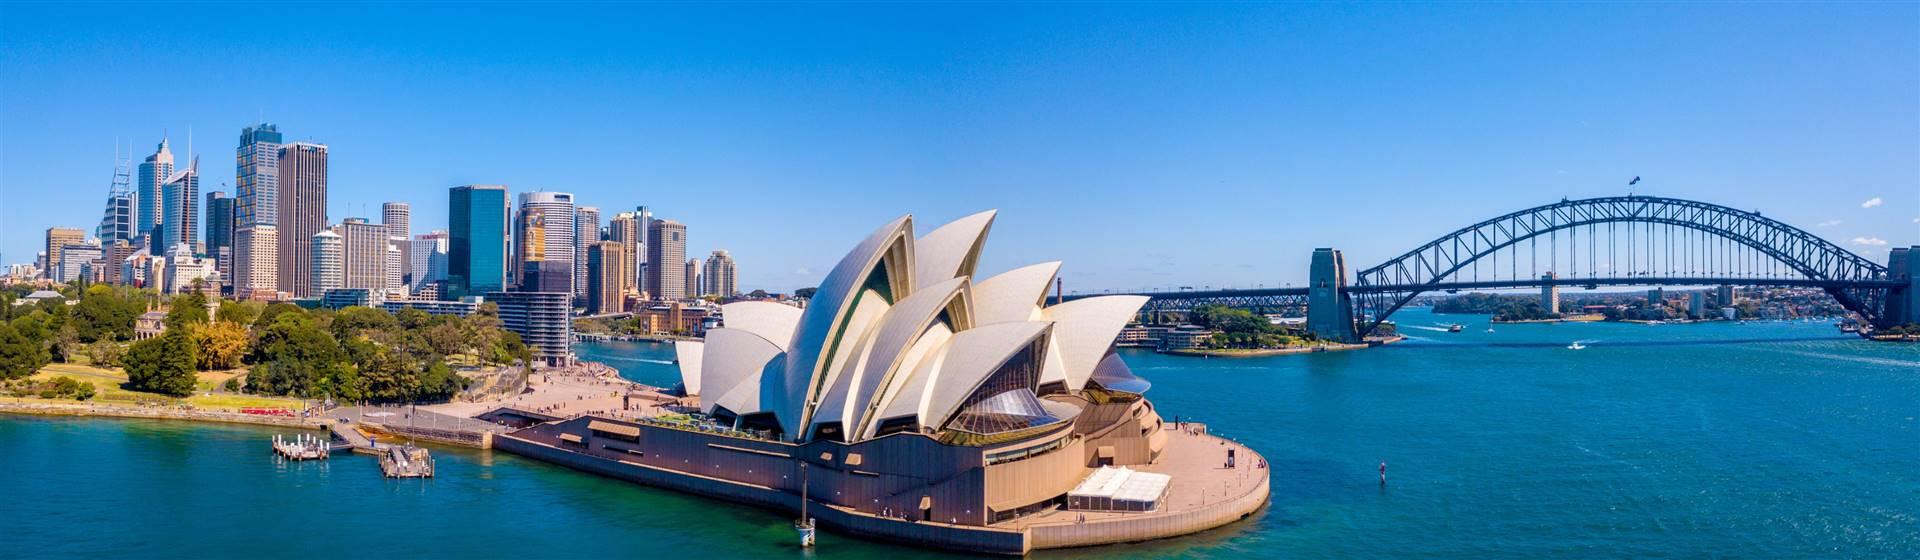 "<img src=""worldwidetours-shutterstock.jpeg"" alt=Sydney Harbour""/>"